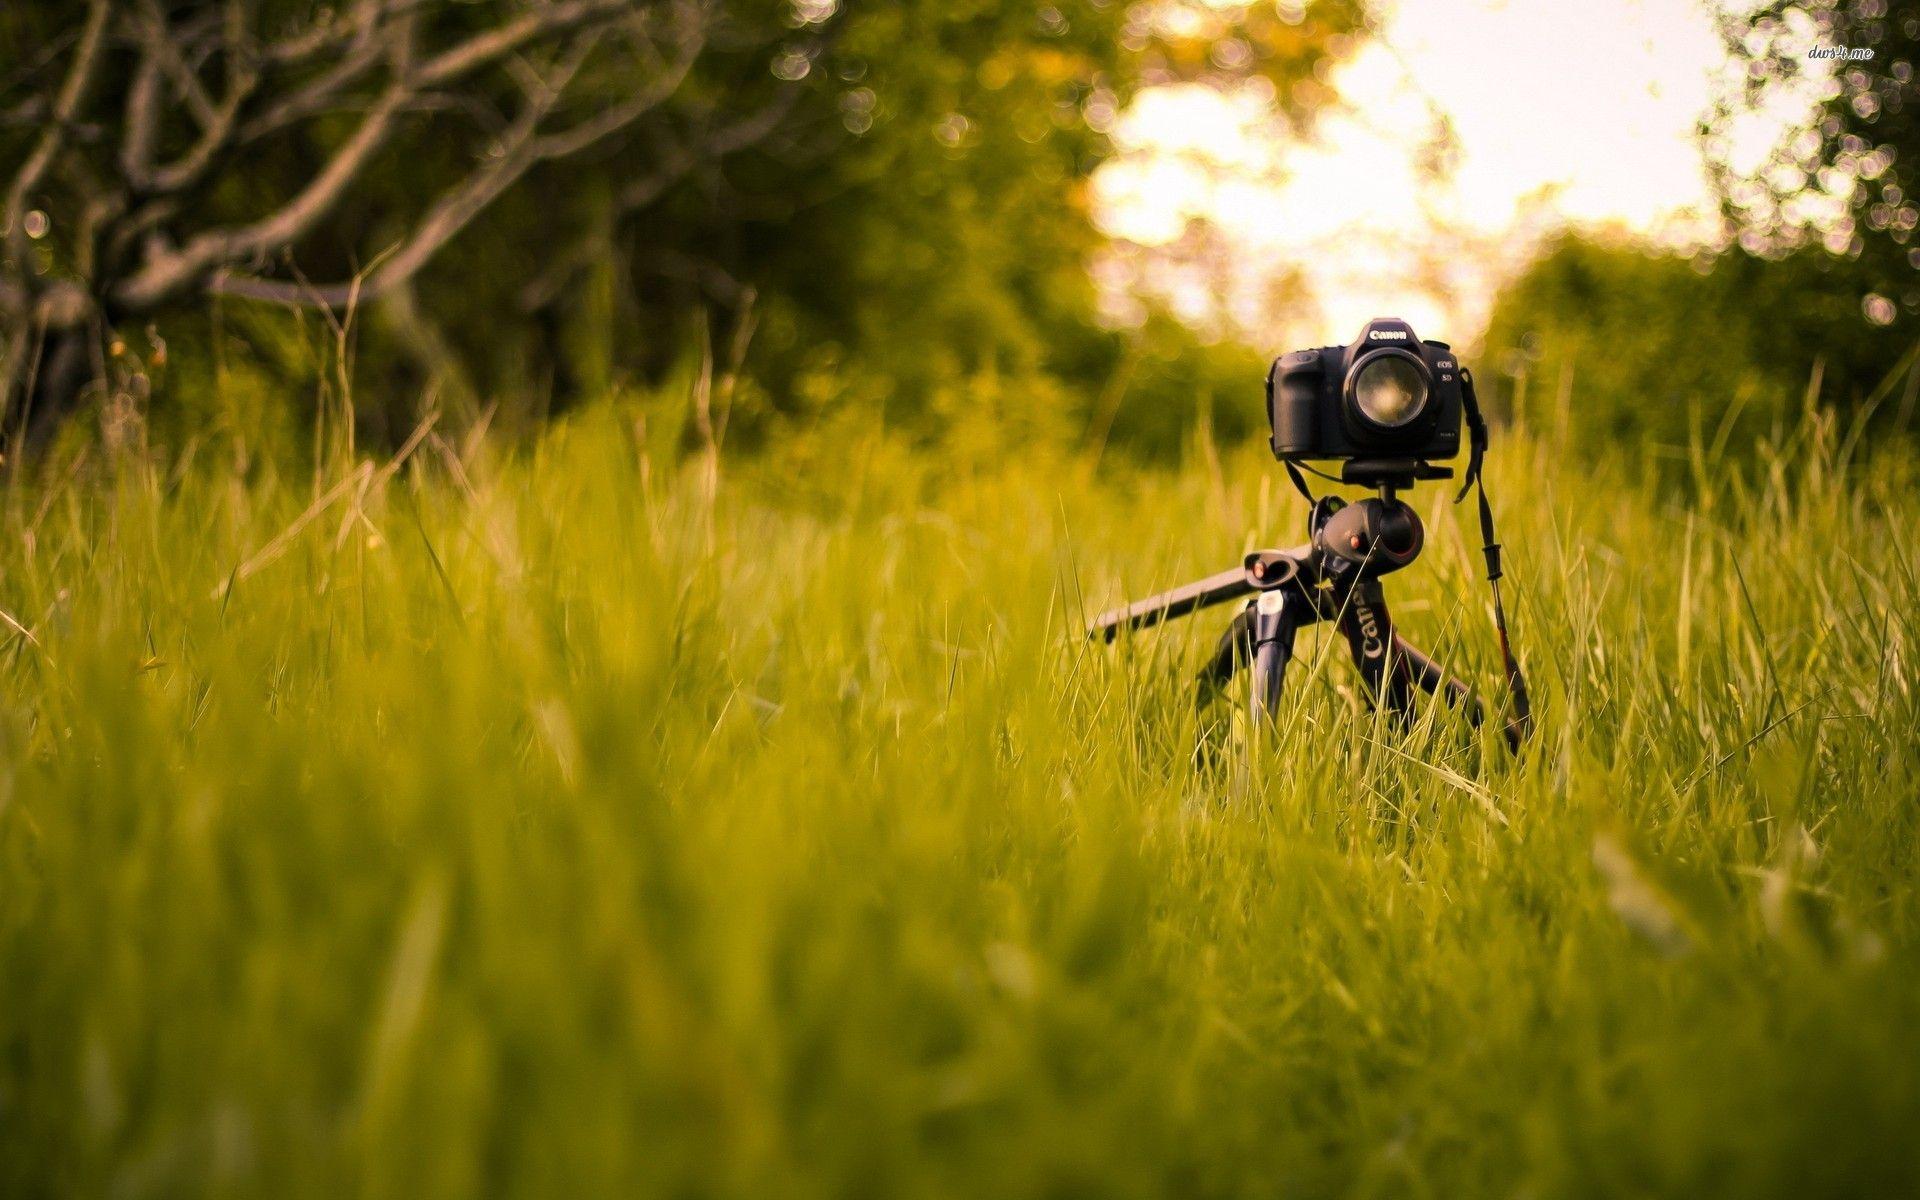 Photography Camera Backgrounds Google Search Camera Wallpaper Grass Wallpaper Technology Wallpaper